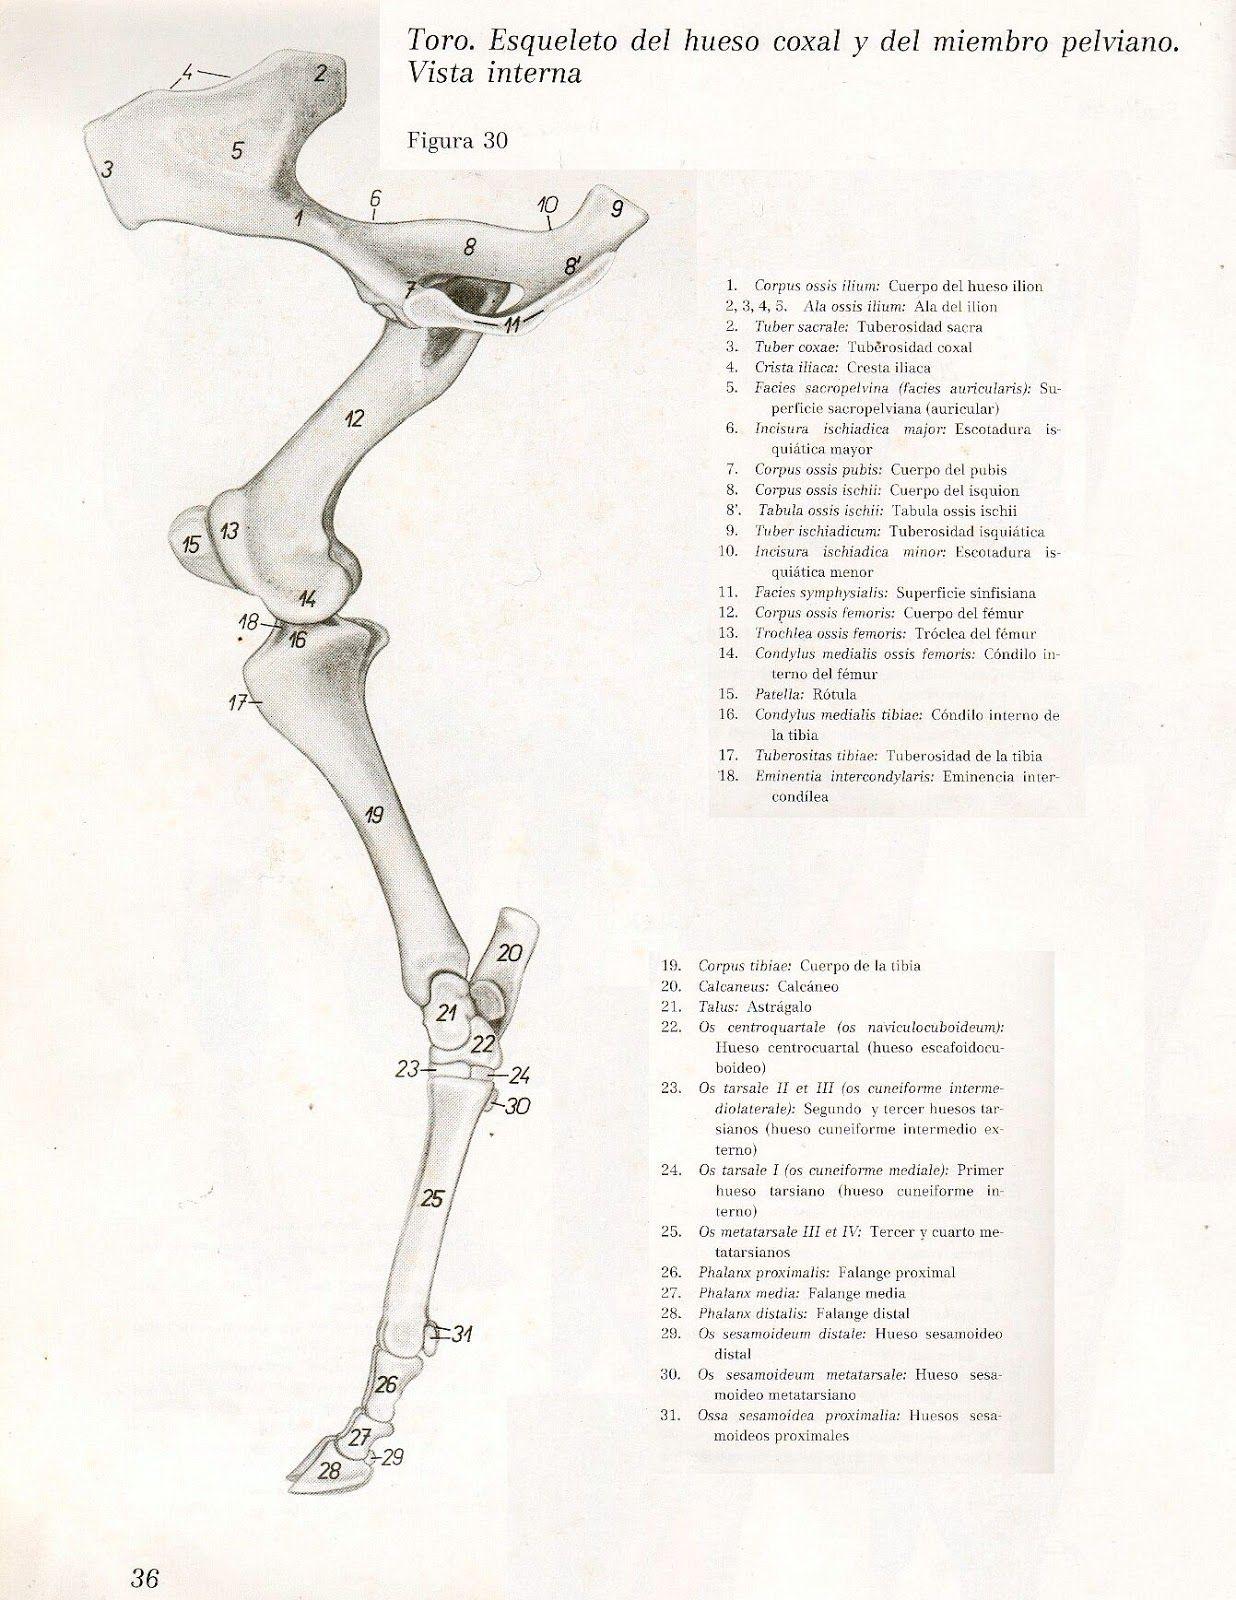 Anatomia Veterinaria: Miembro Pelviano (Toro) | Veterinary Student ...